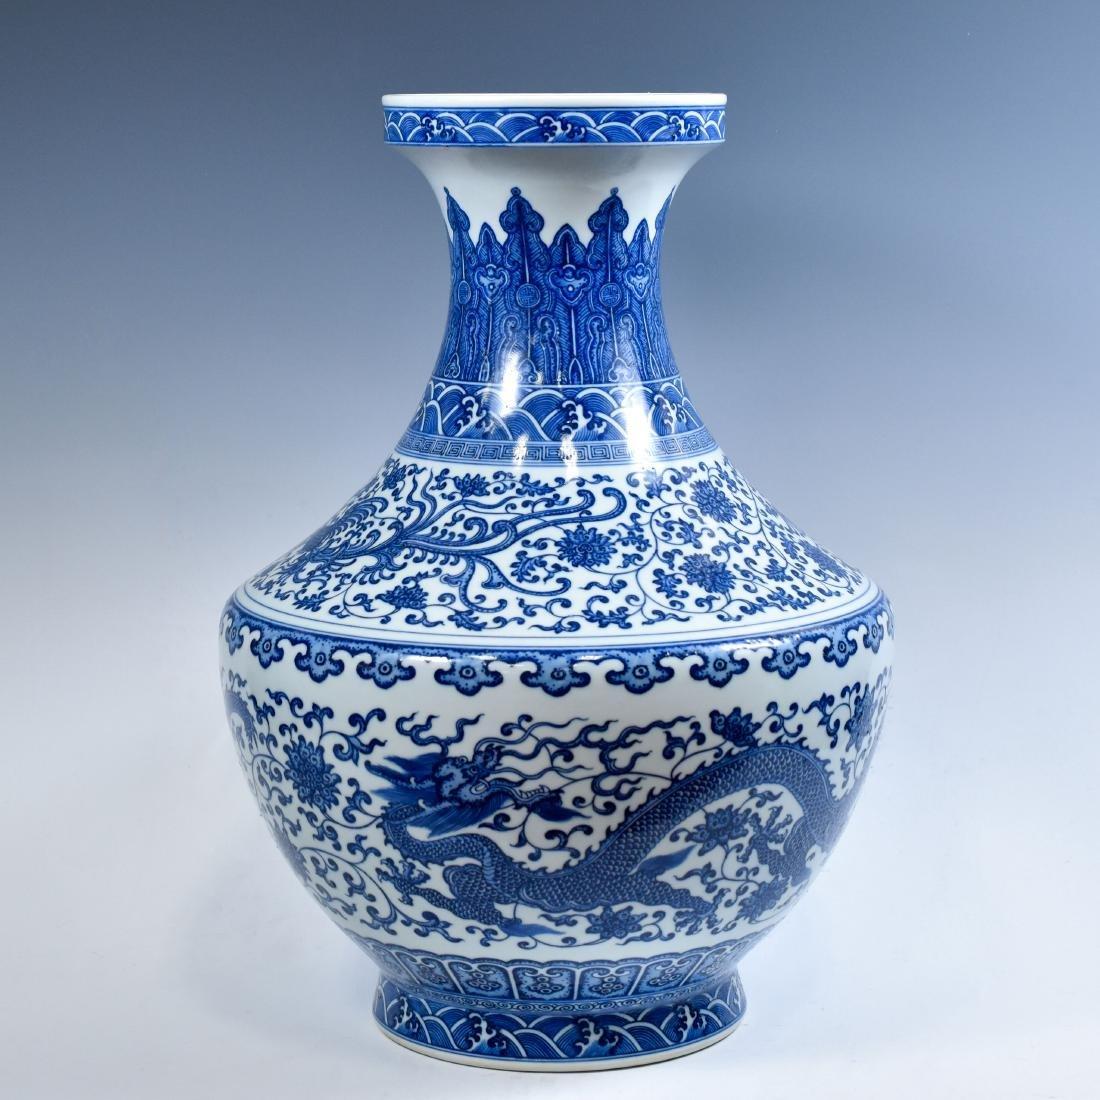 LARGE CHINESE BLUE & WHITE DRAGON LOTUS ARROW VASE